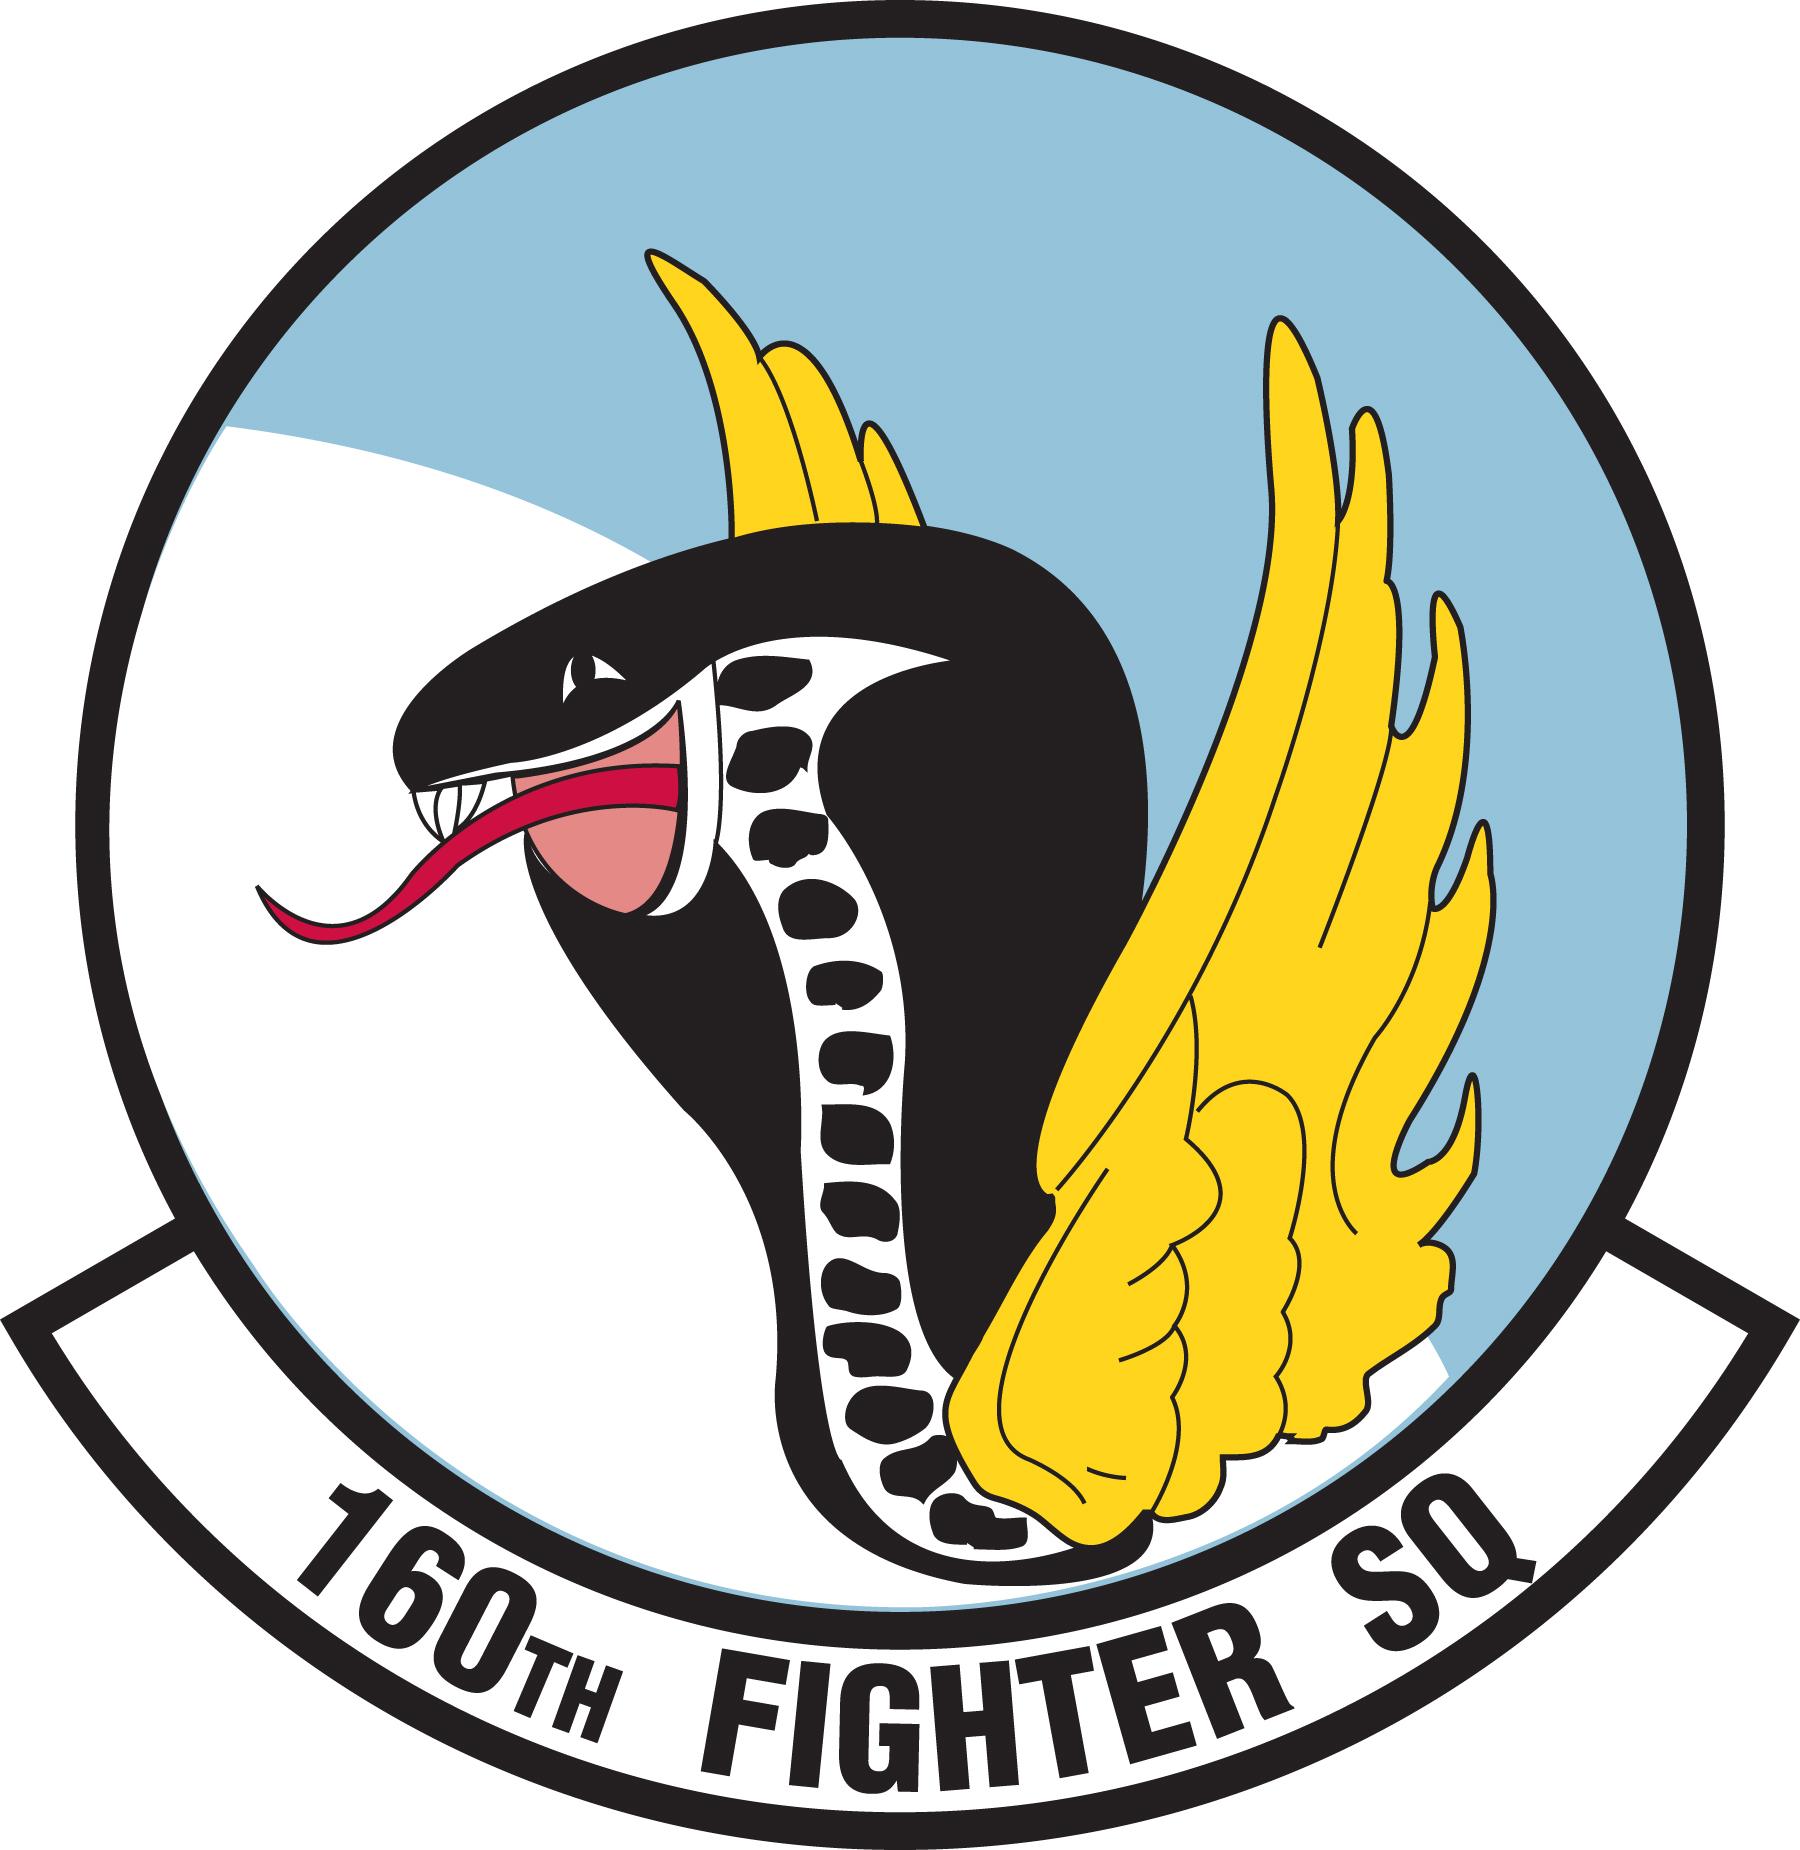 Fighter Squadron Logos File:160th Fighter Squadron